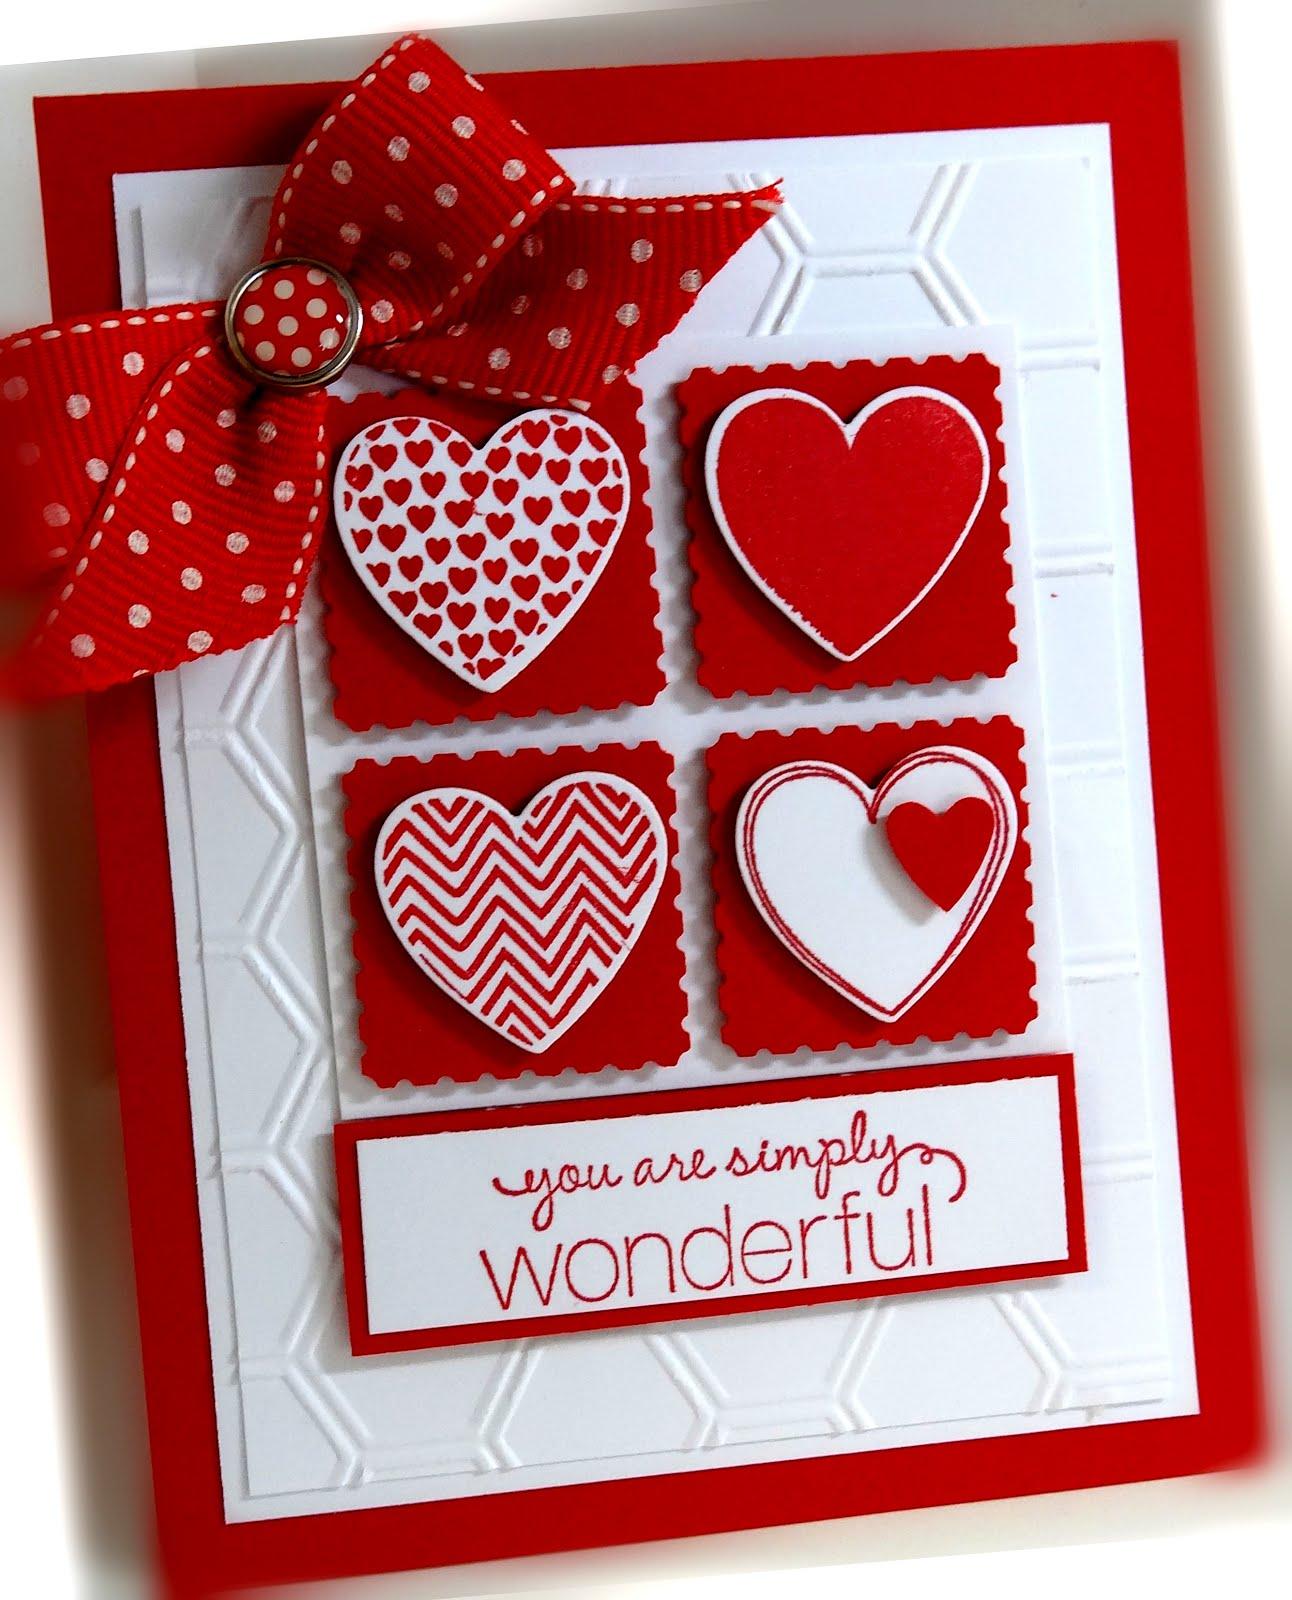 adrisaurus valentine's day cards - Daniela Art Attack Manualidades de San Valentn para niños